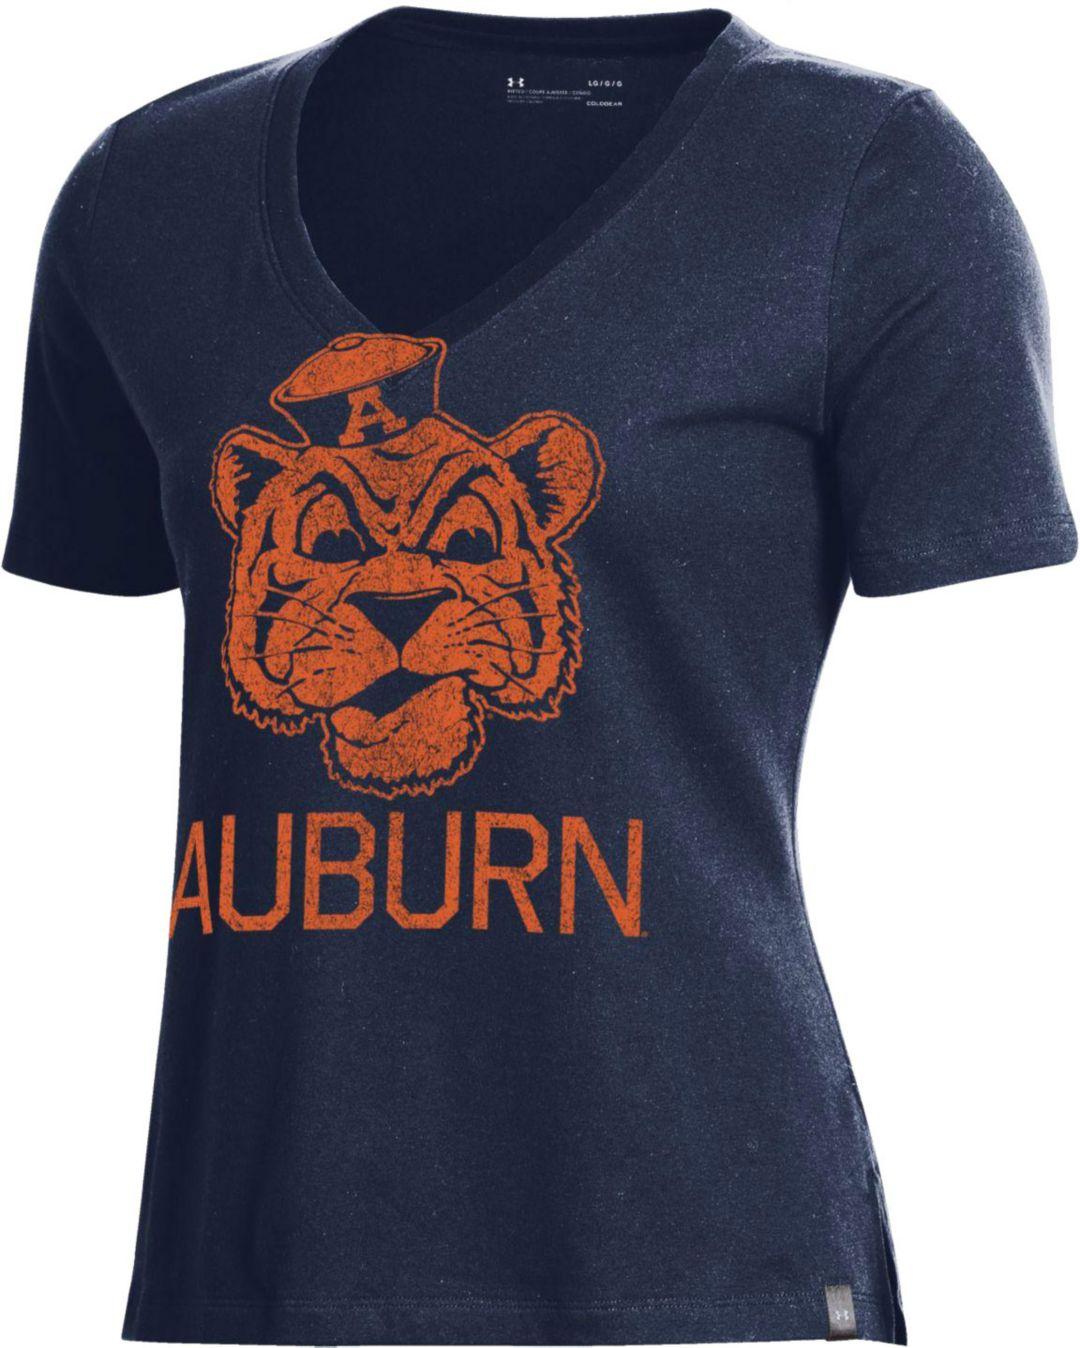 3119f58ee Under Armour Women's Auburn Tigers Blue Performance V-Neck T-Shirt